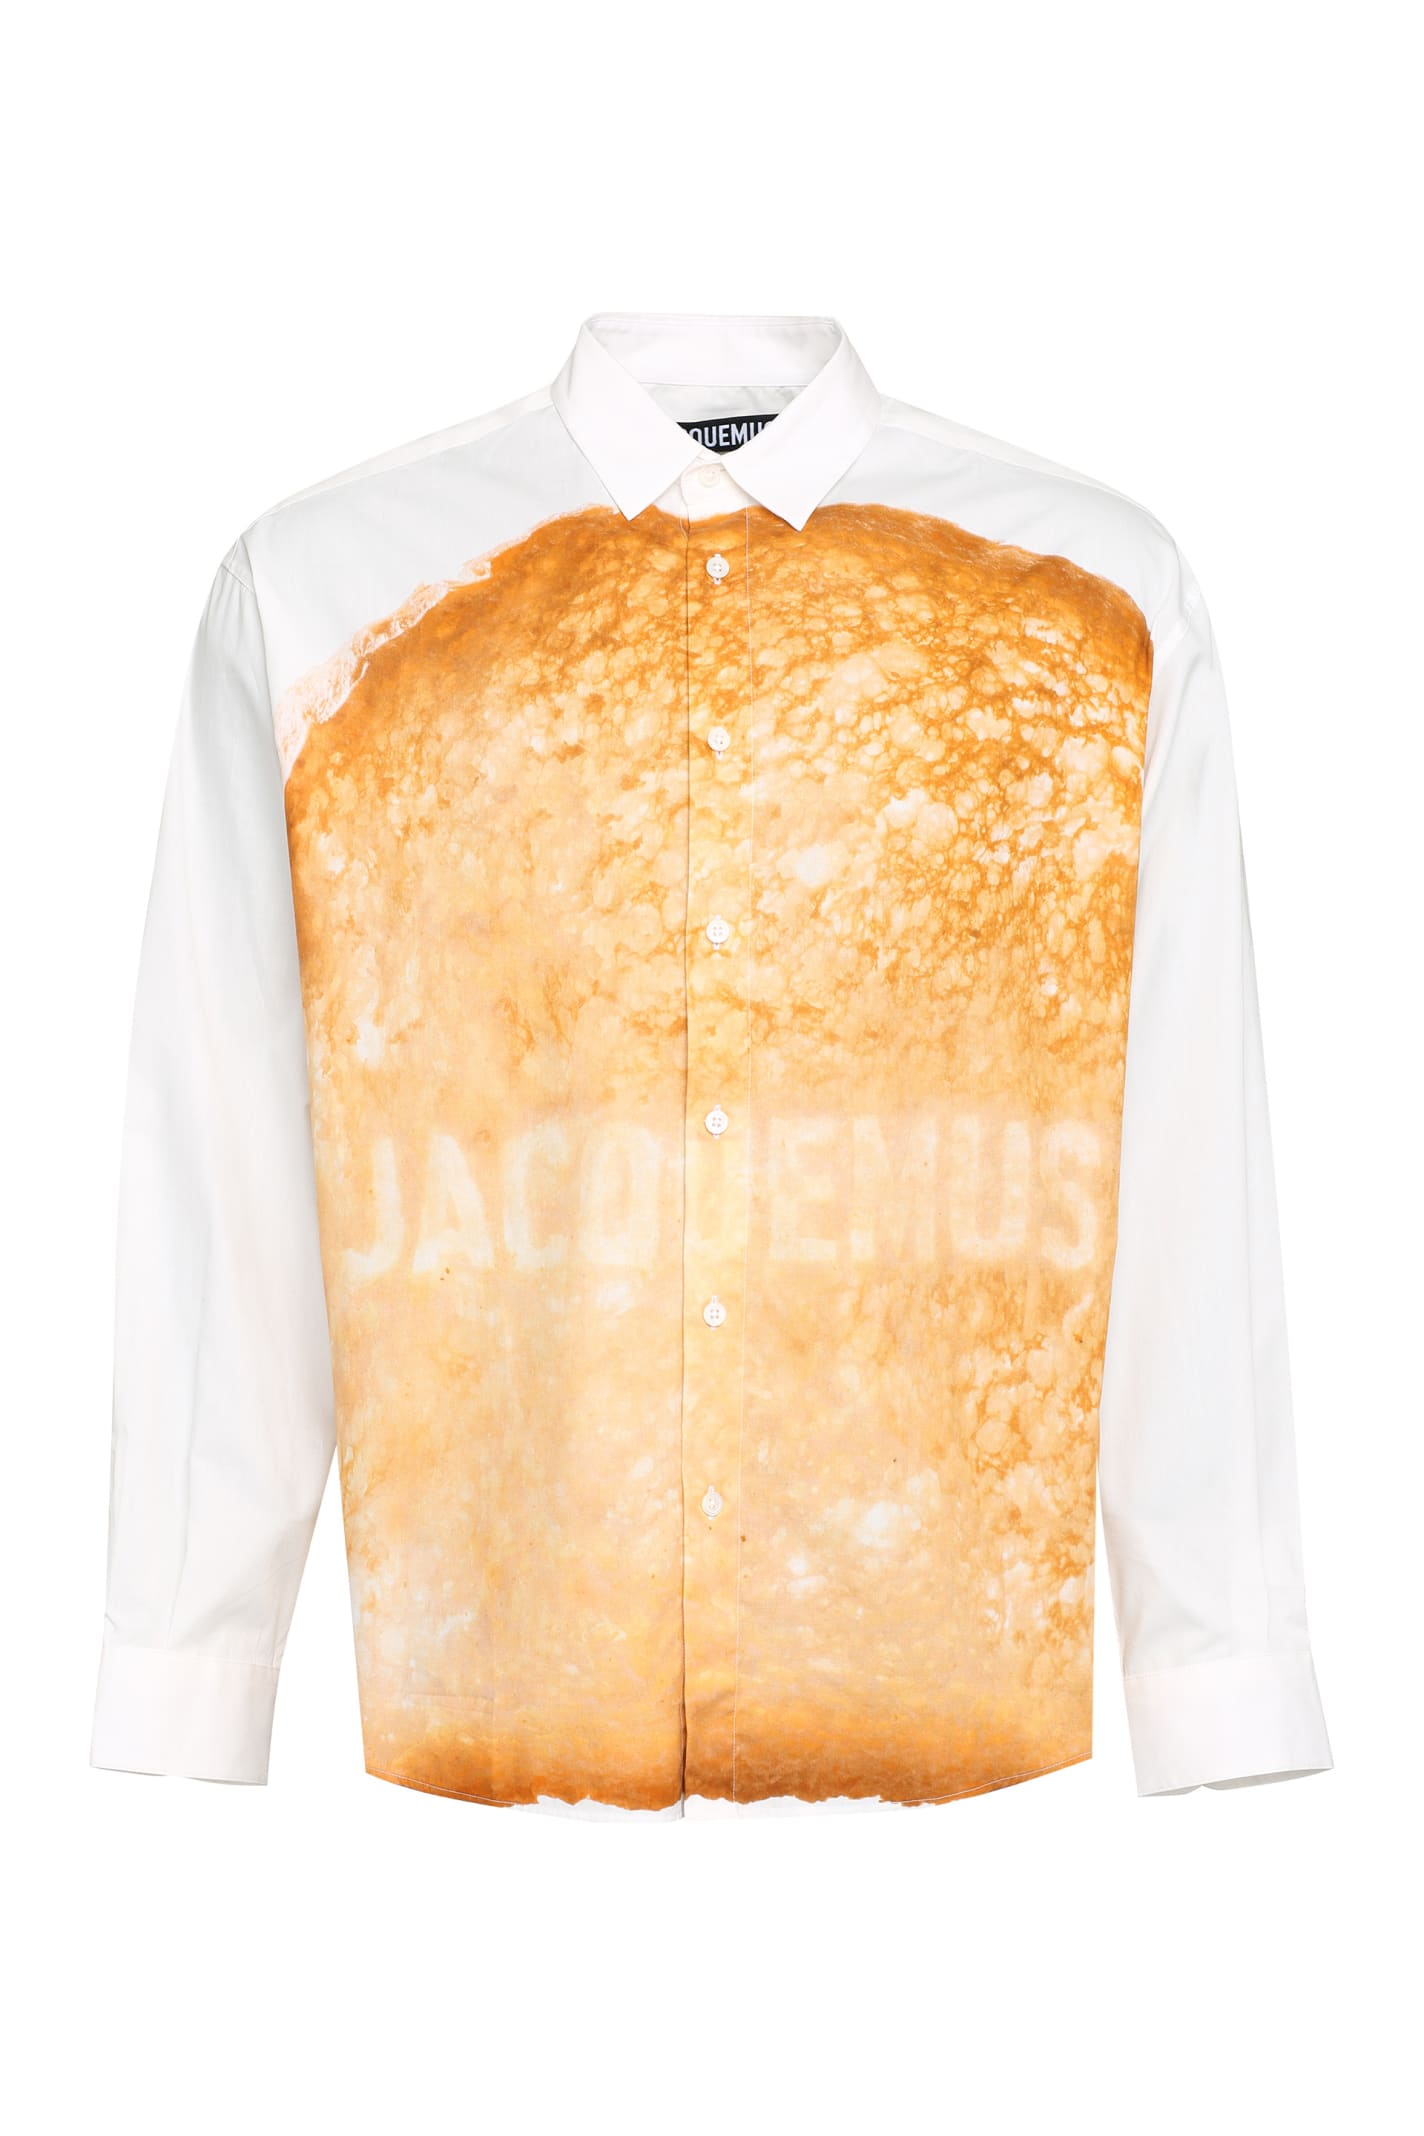 Jacquemus Printed Cotton Shirt